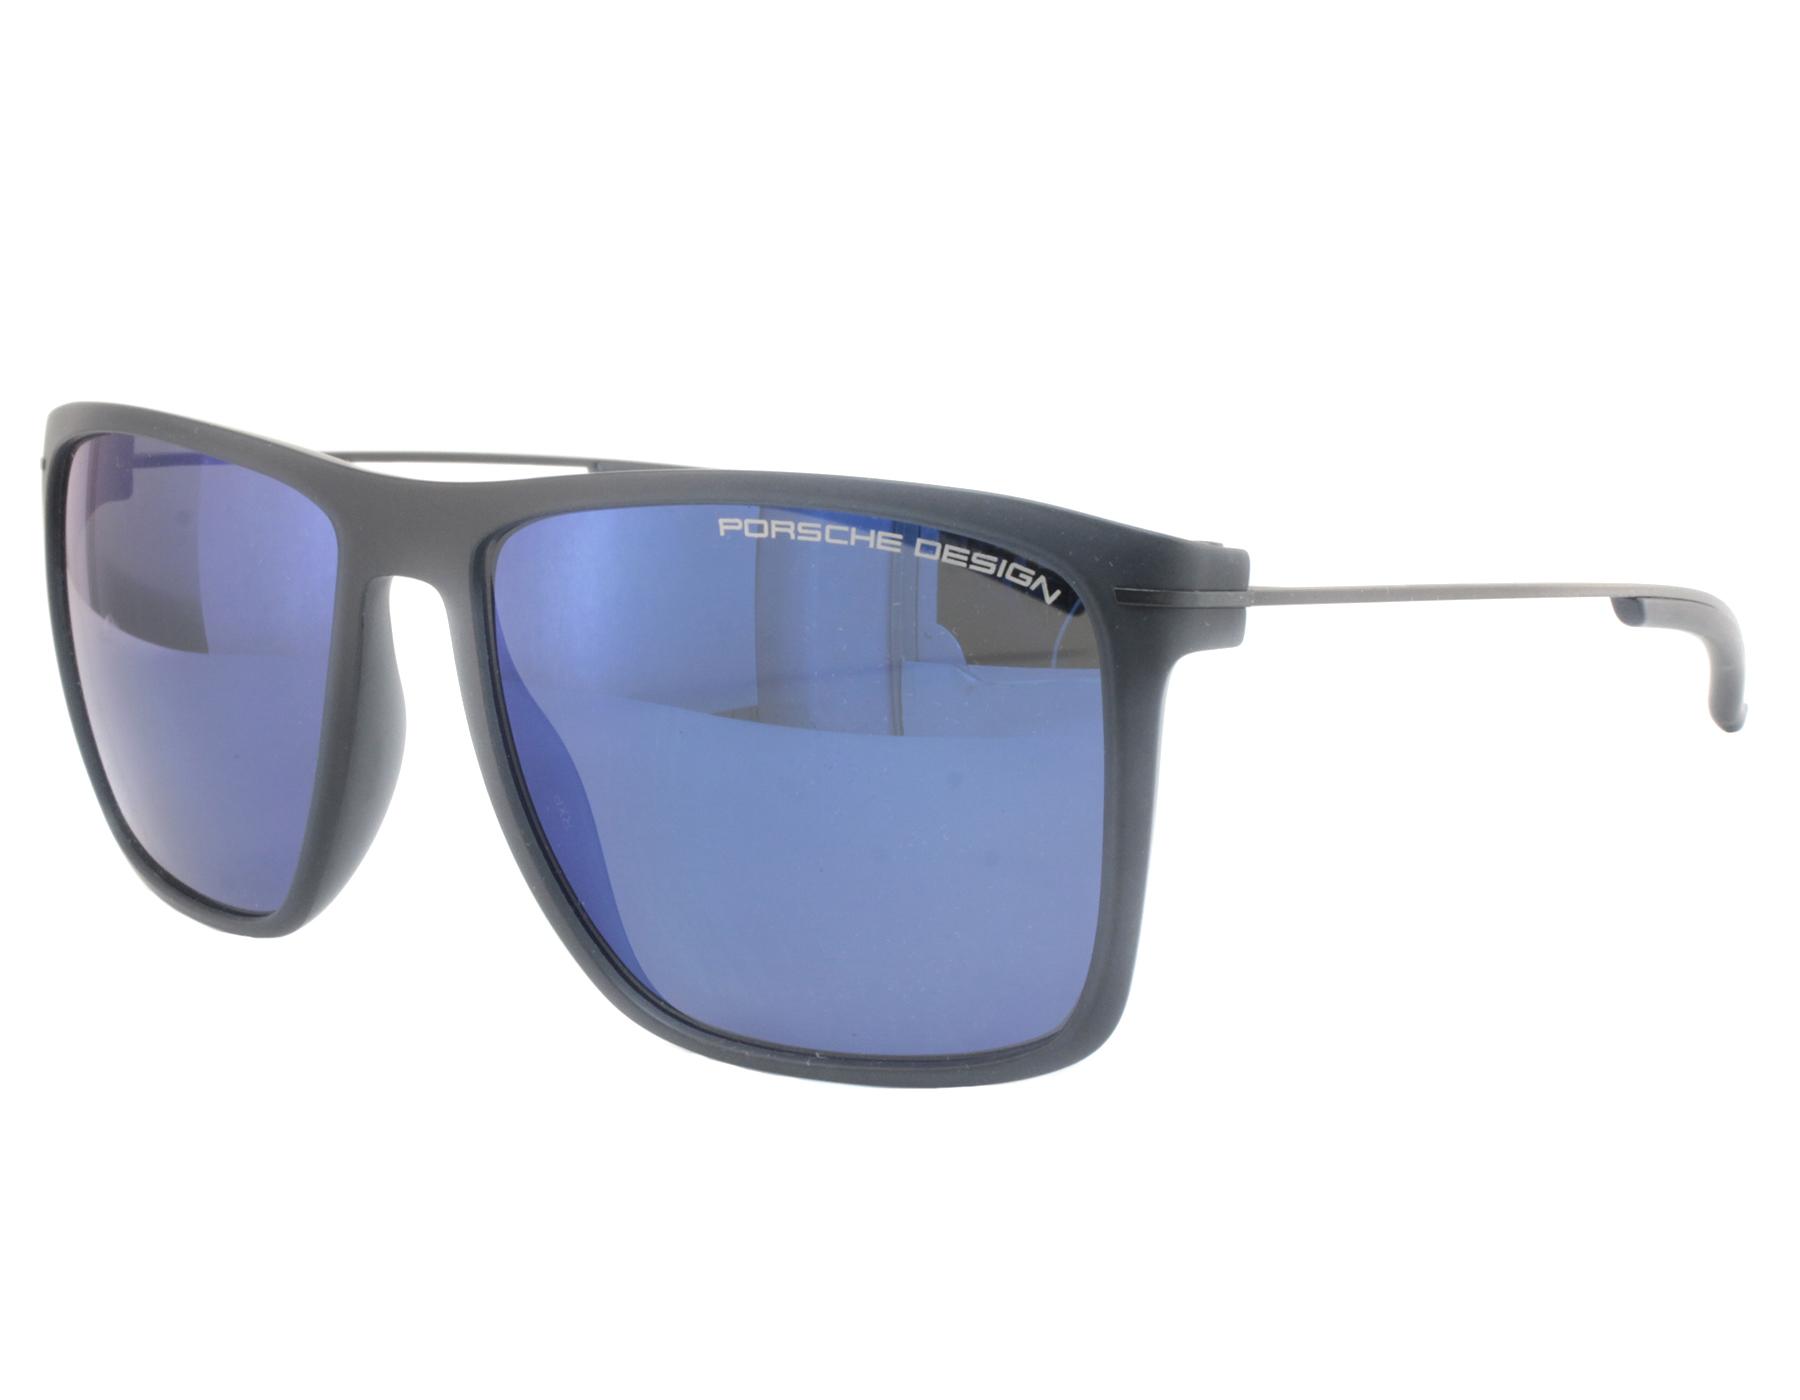 7ad9df2f592c NEW Porsche Design P8636 B 58mm Blue Transparent   Blue Sunglasses ...